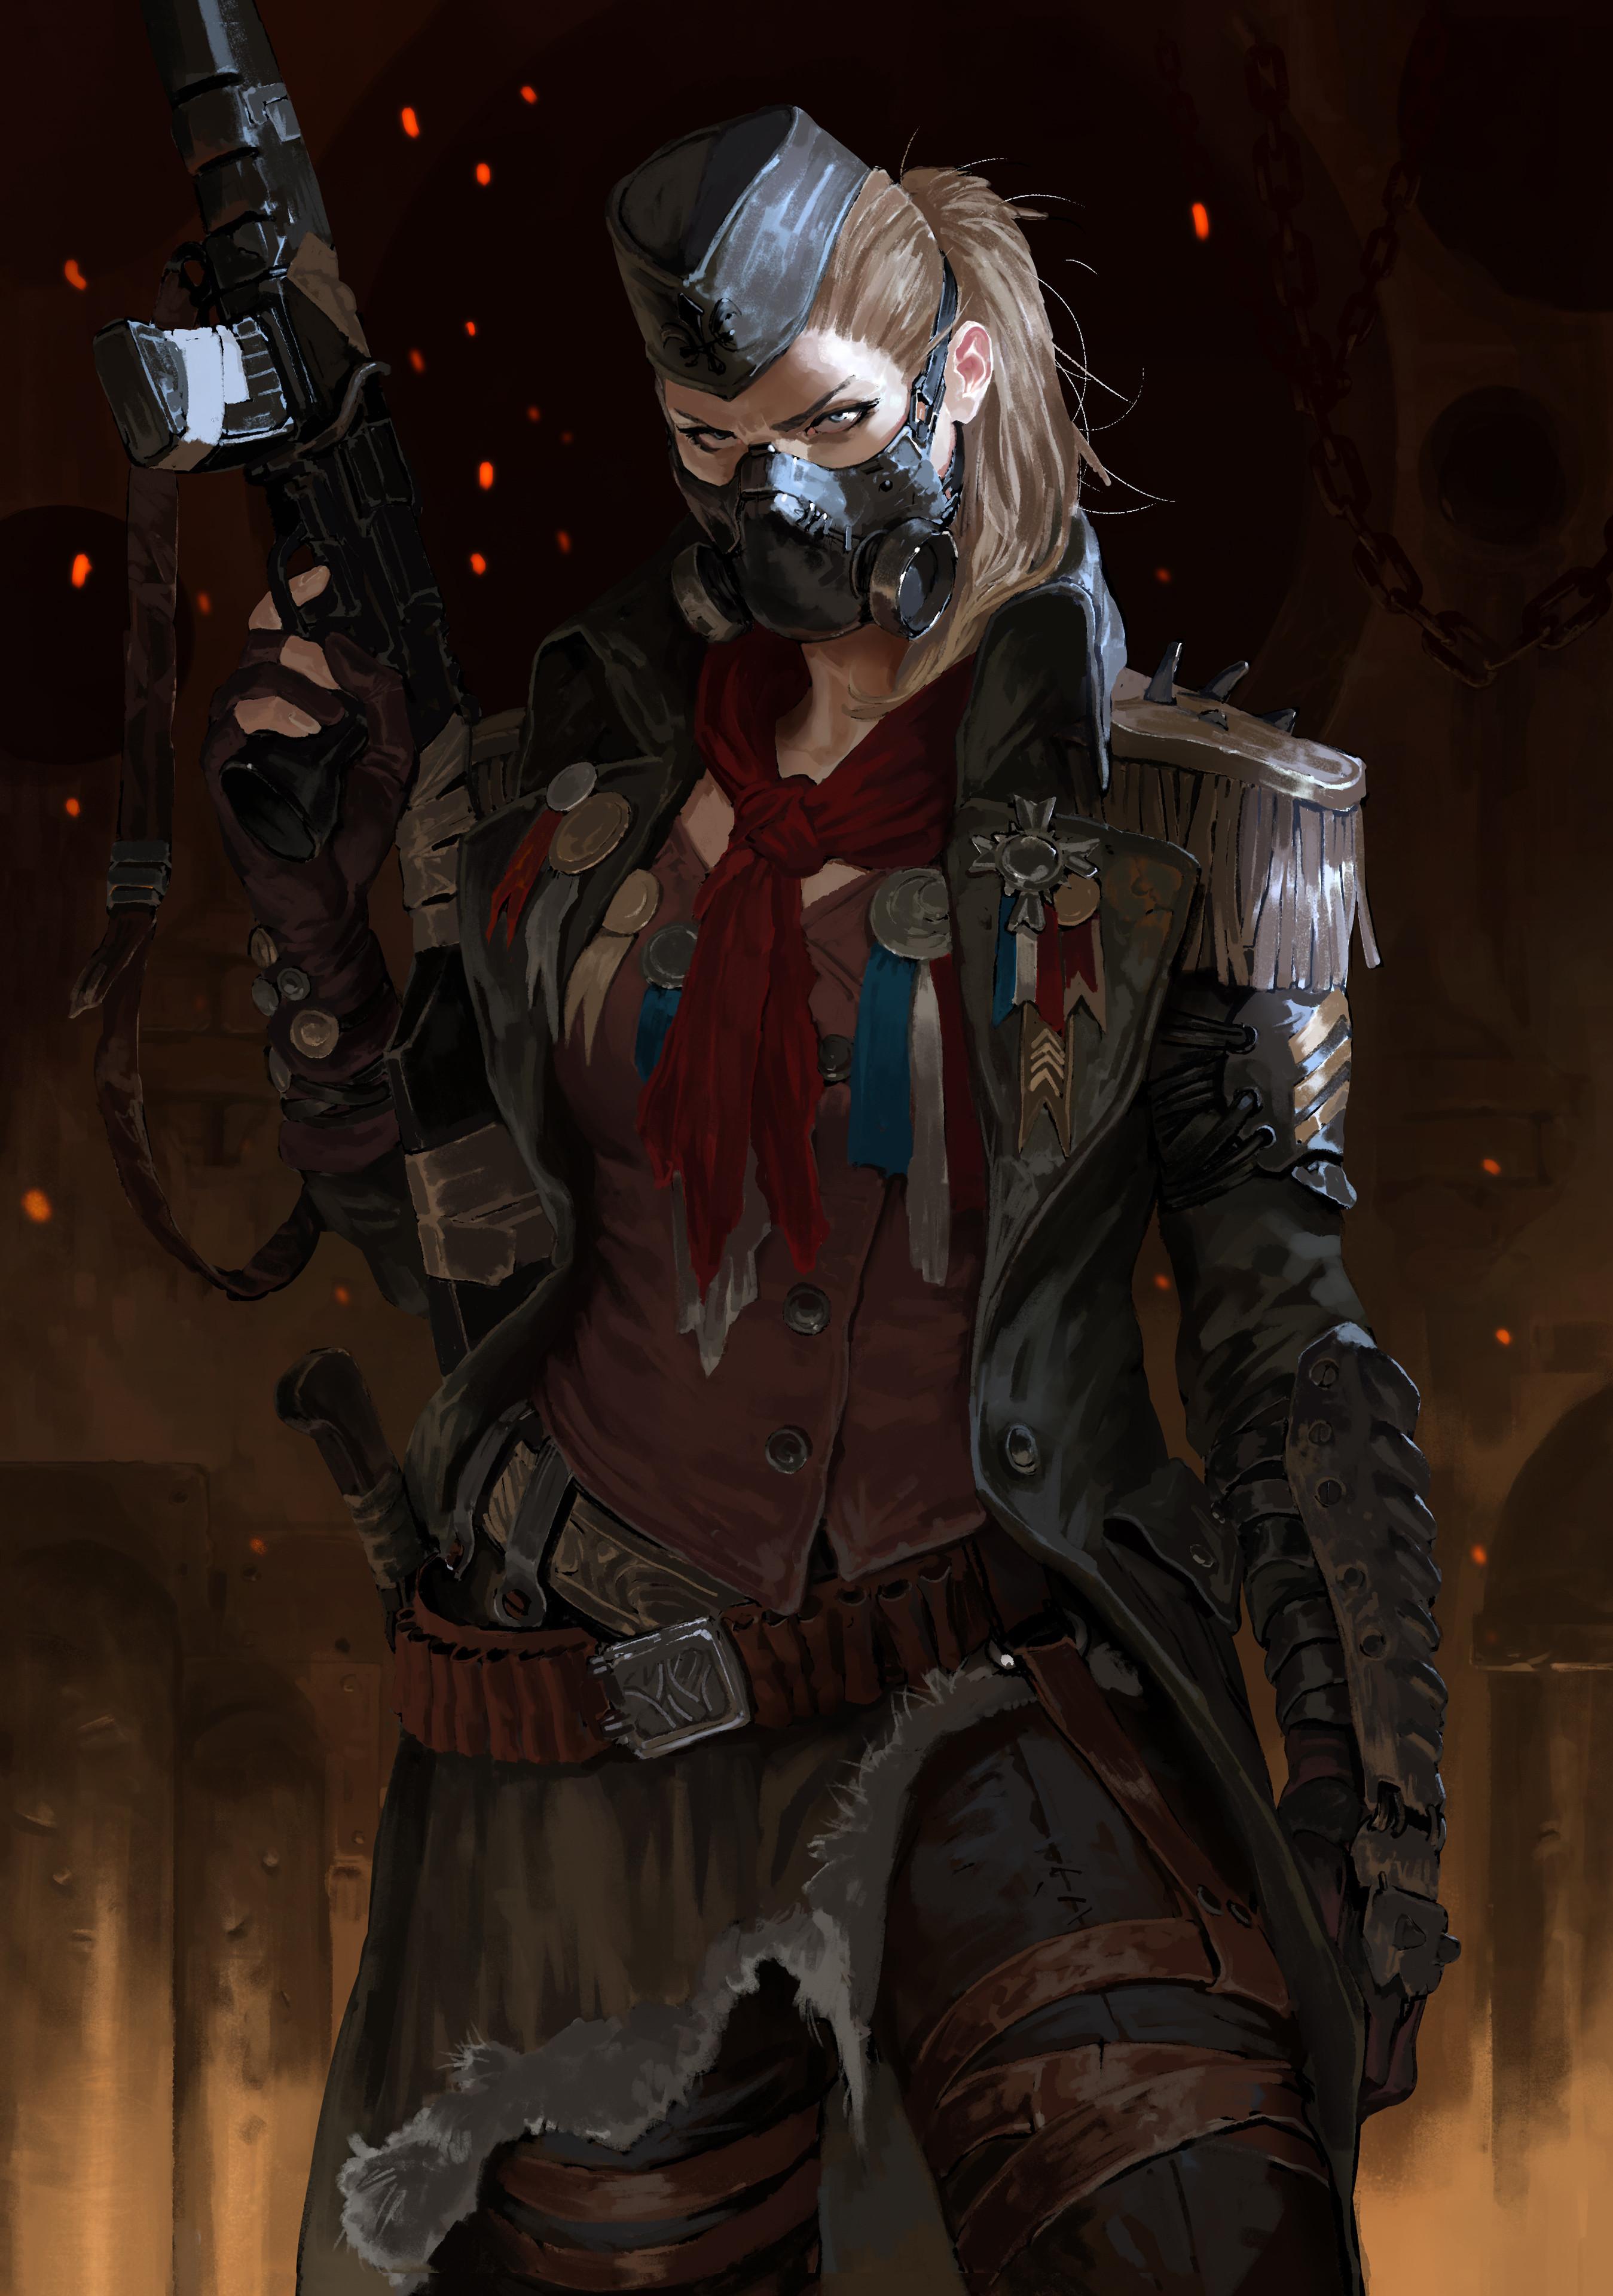 General 2698x3840 blonde mask gun assault rifle women portrait display sparks digital art digital painting fan art artwork